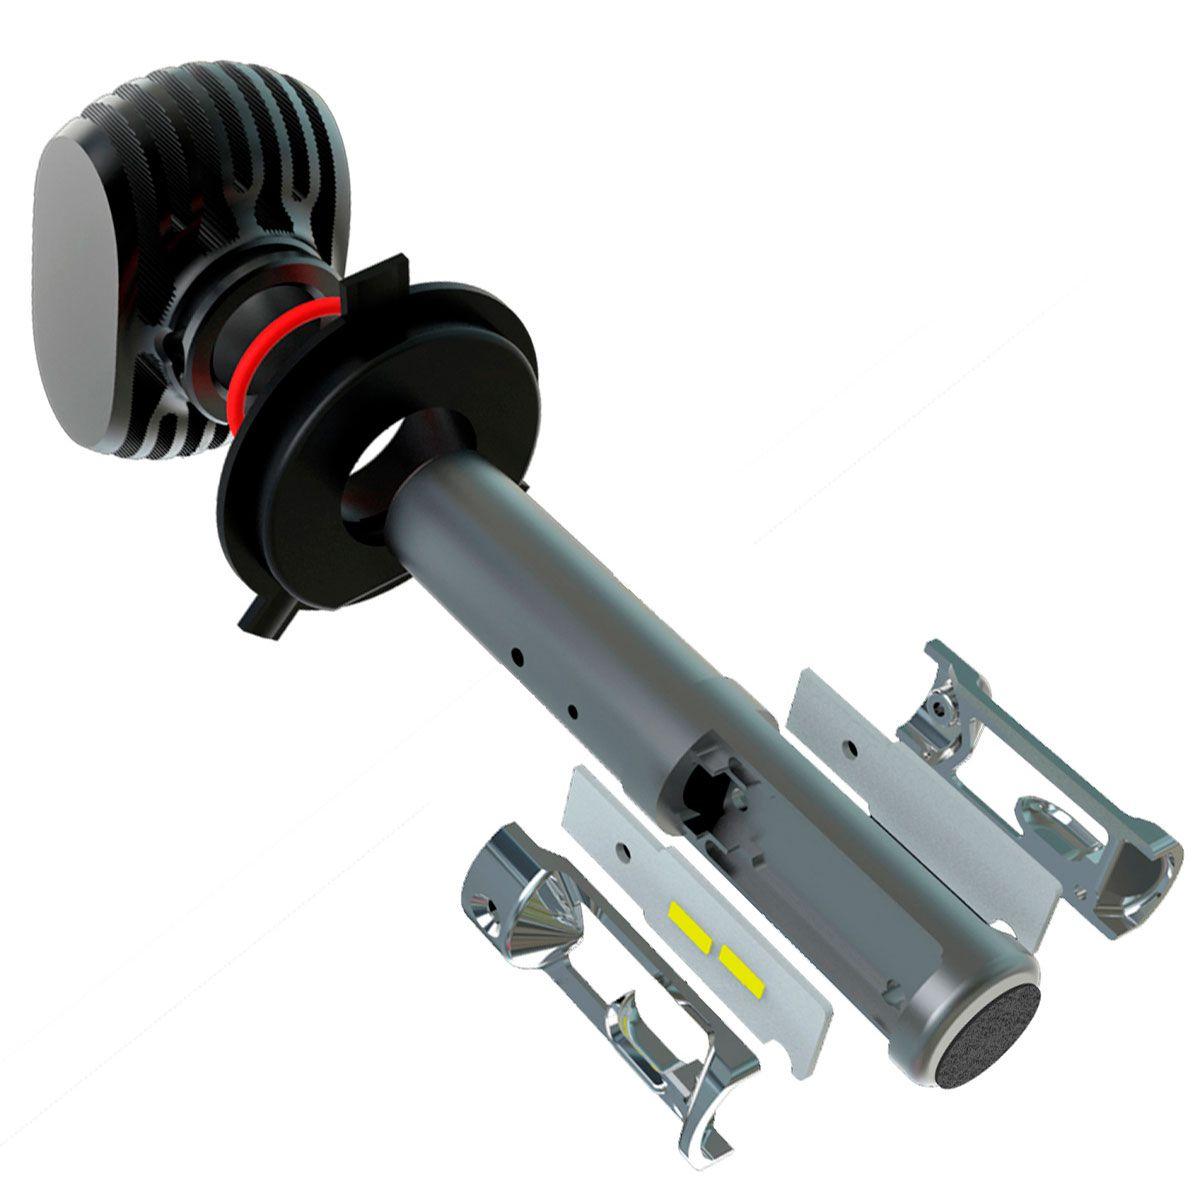 Kit Ultra LED Golf 2007 2008 2009 2010 2011 2012 2013 tipo xenon farol baixo H7 50W